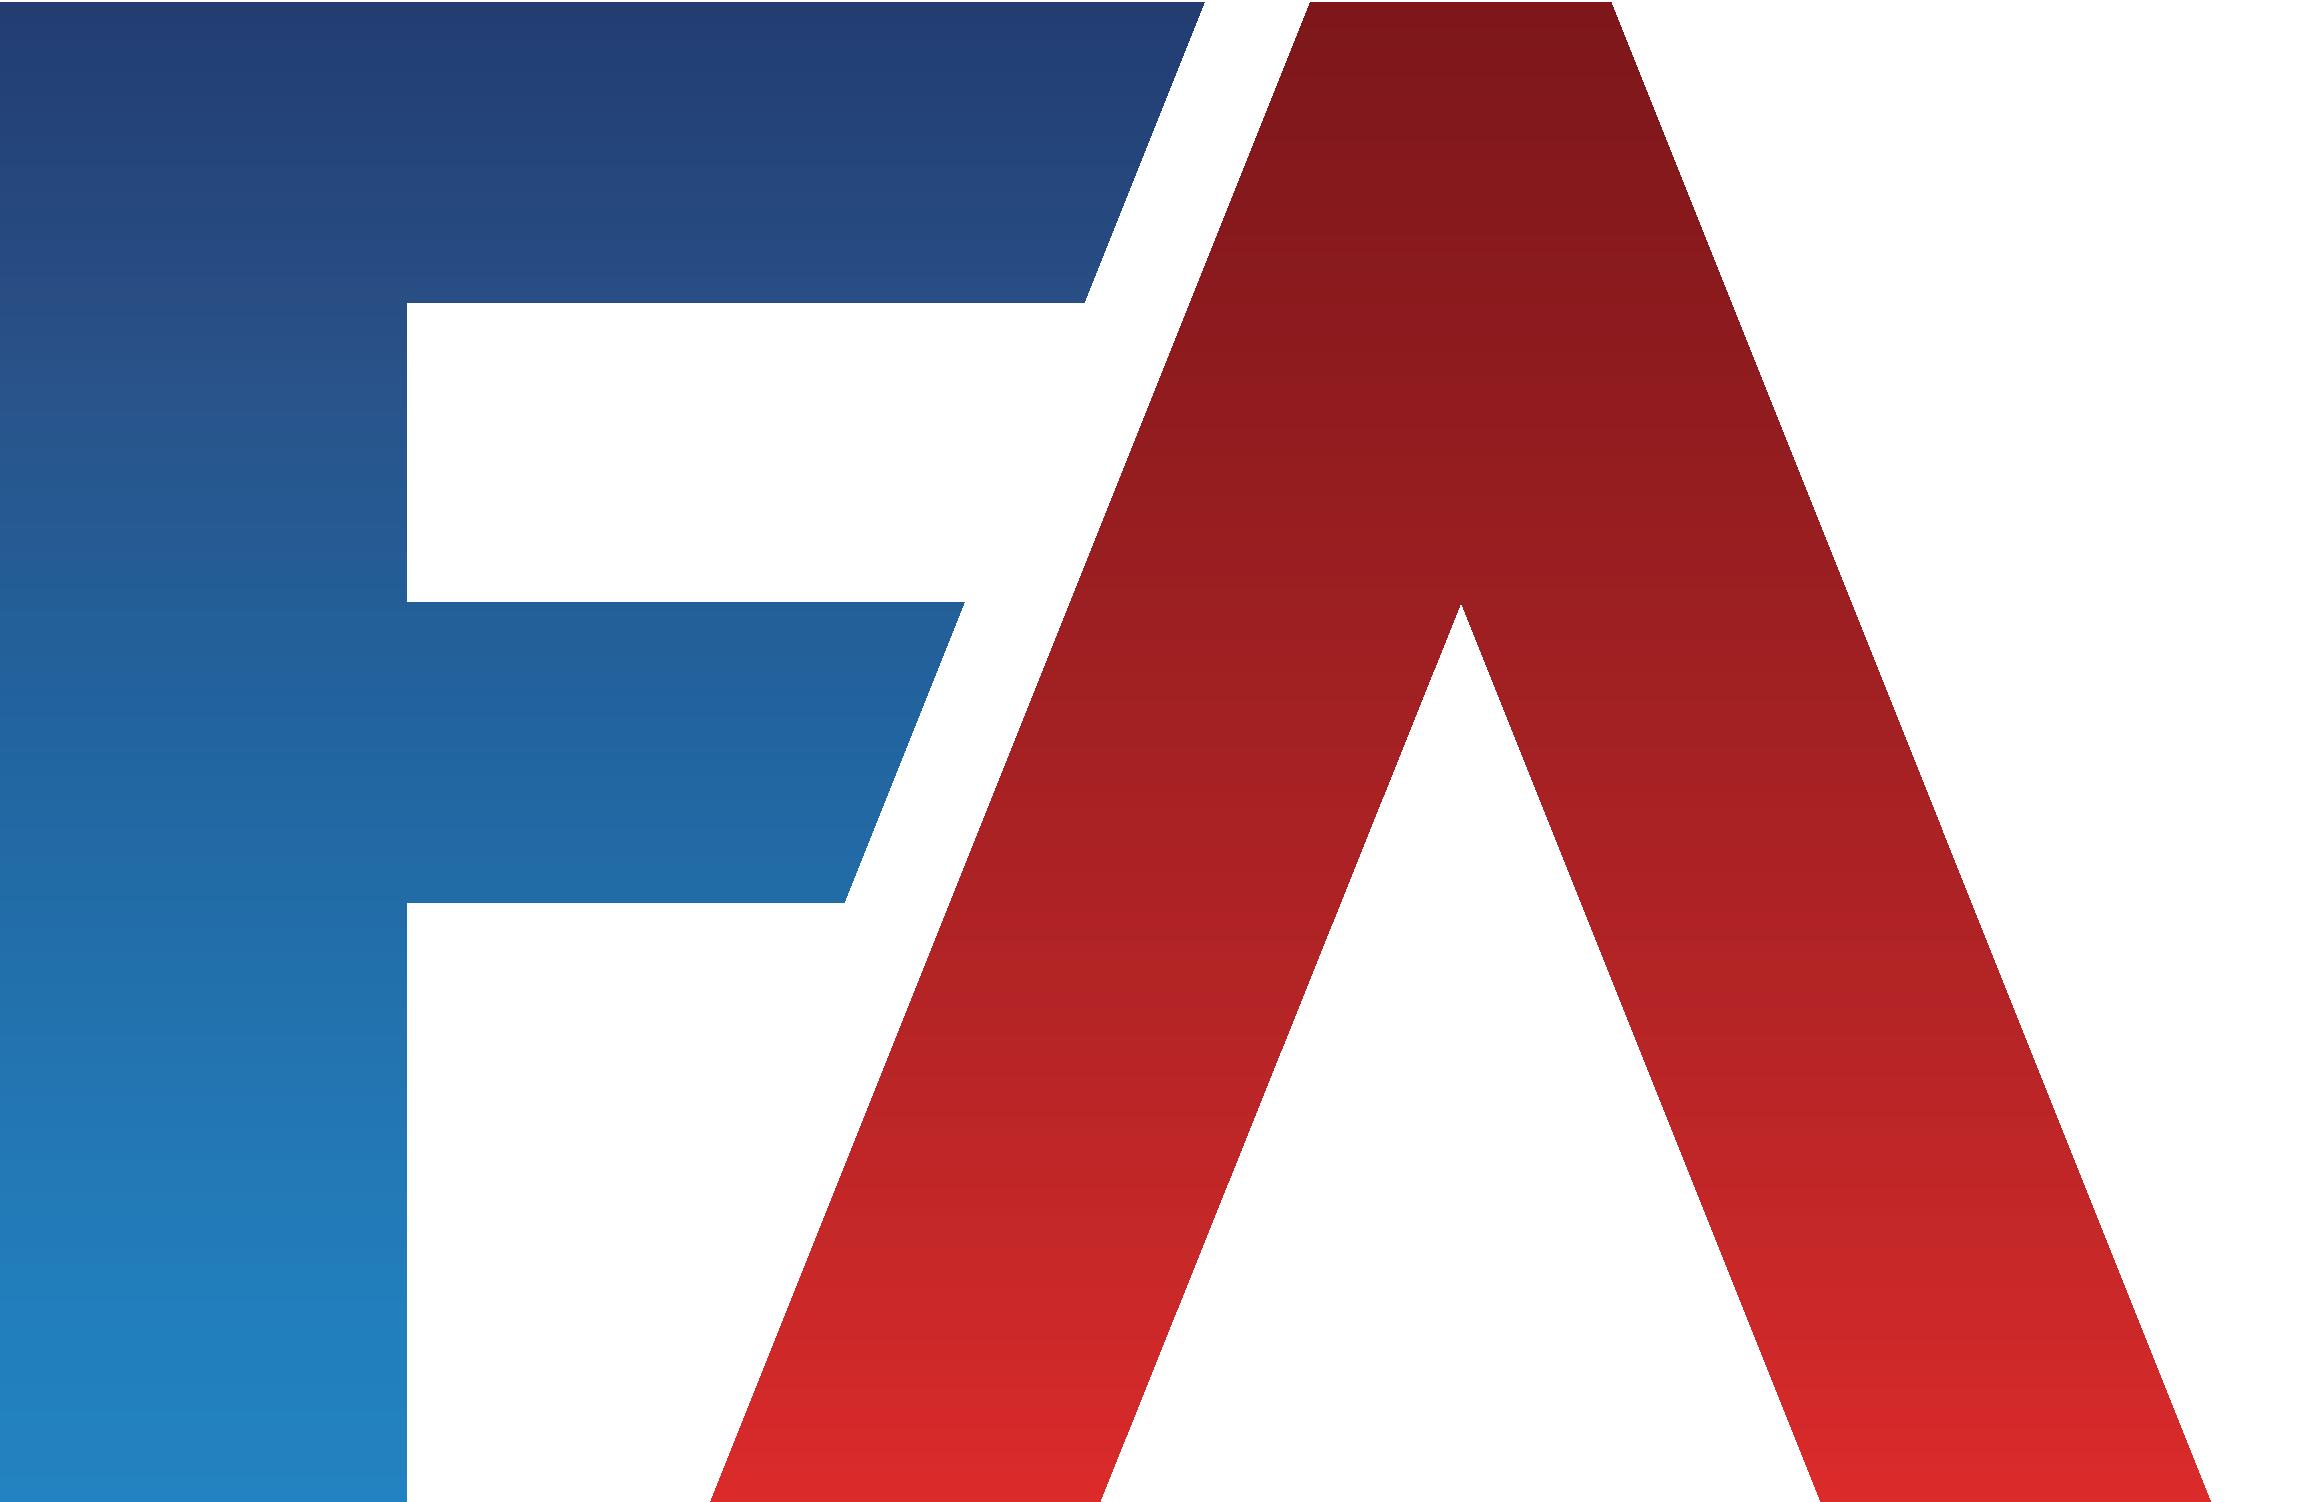 MLB Waiver-Wire: Wk.1 Pitchers | FantasyAlarm.com